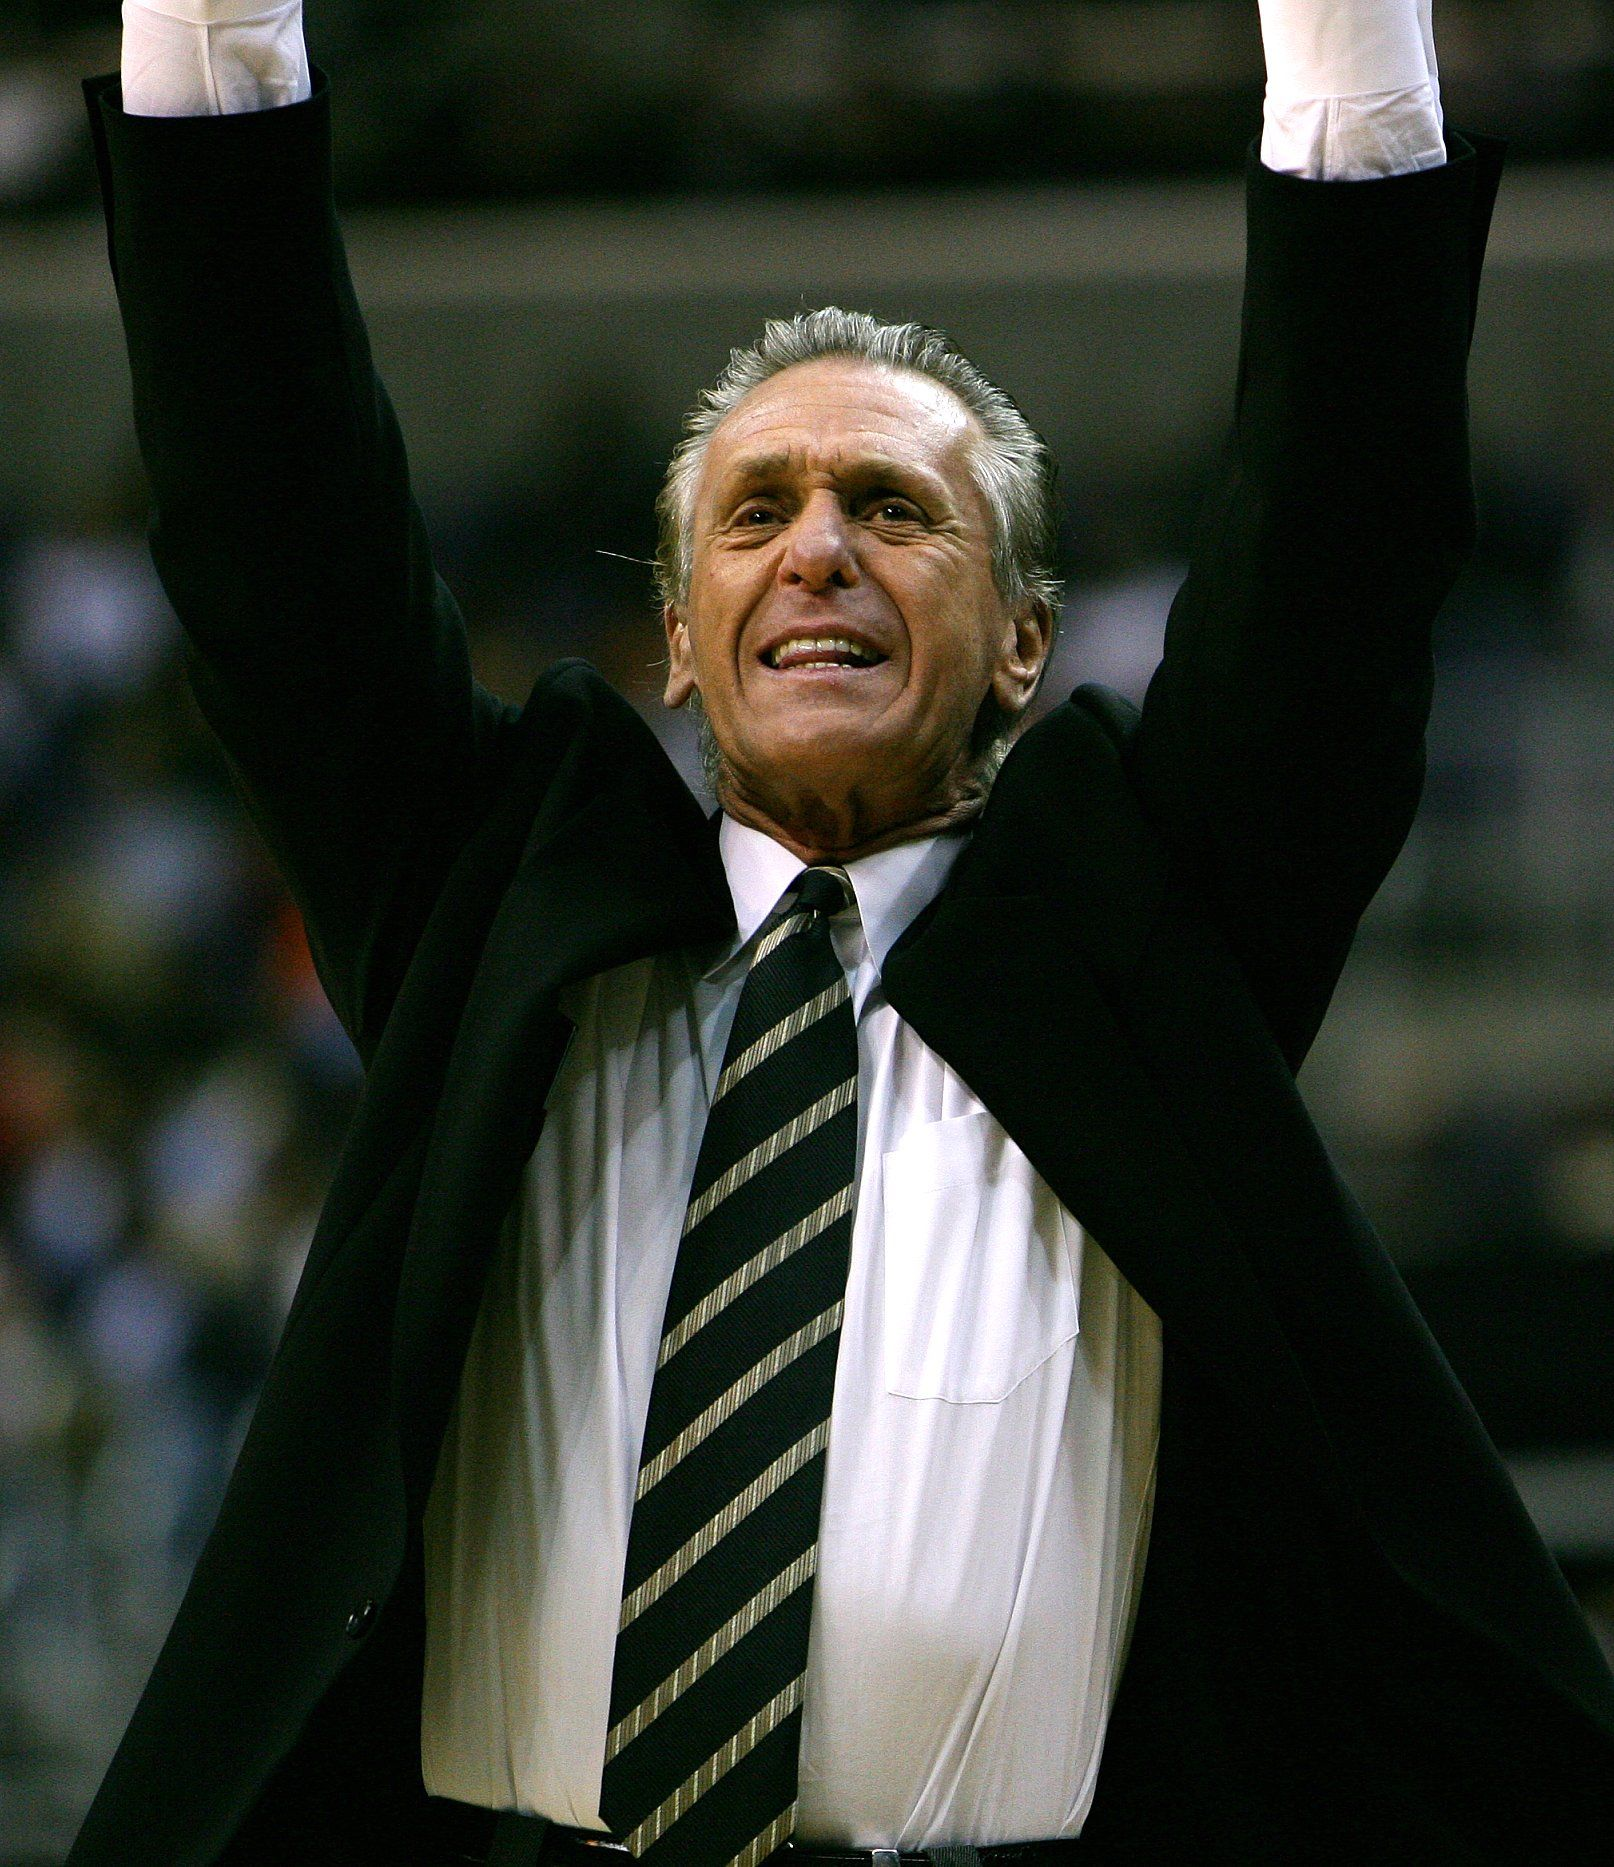 NBA Rumors: Pat Riley, Miami Heat Preparing For Kevin Durant Free Agency - http://www.morningnewsusa.com/nba-rumors-pat-riley-miami-heat-preparing-kevin-durant-free-agency-2365347.html